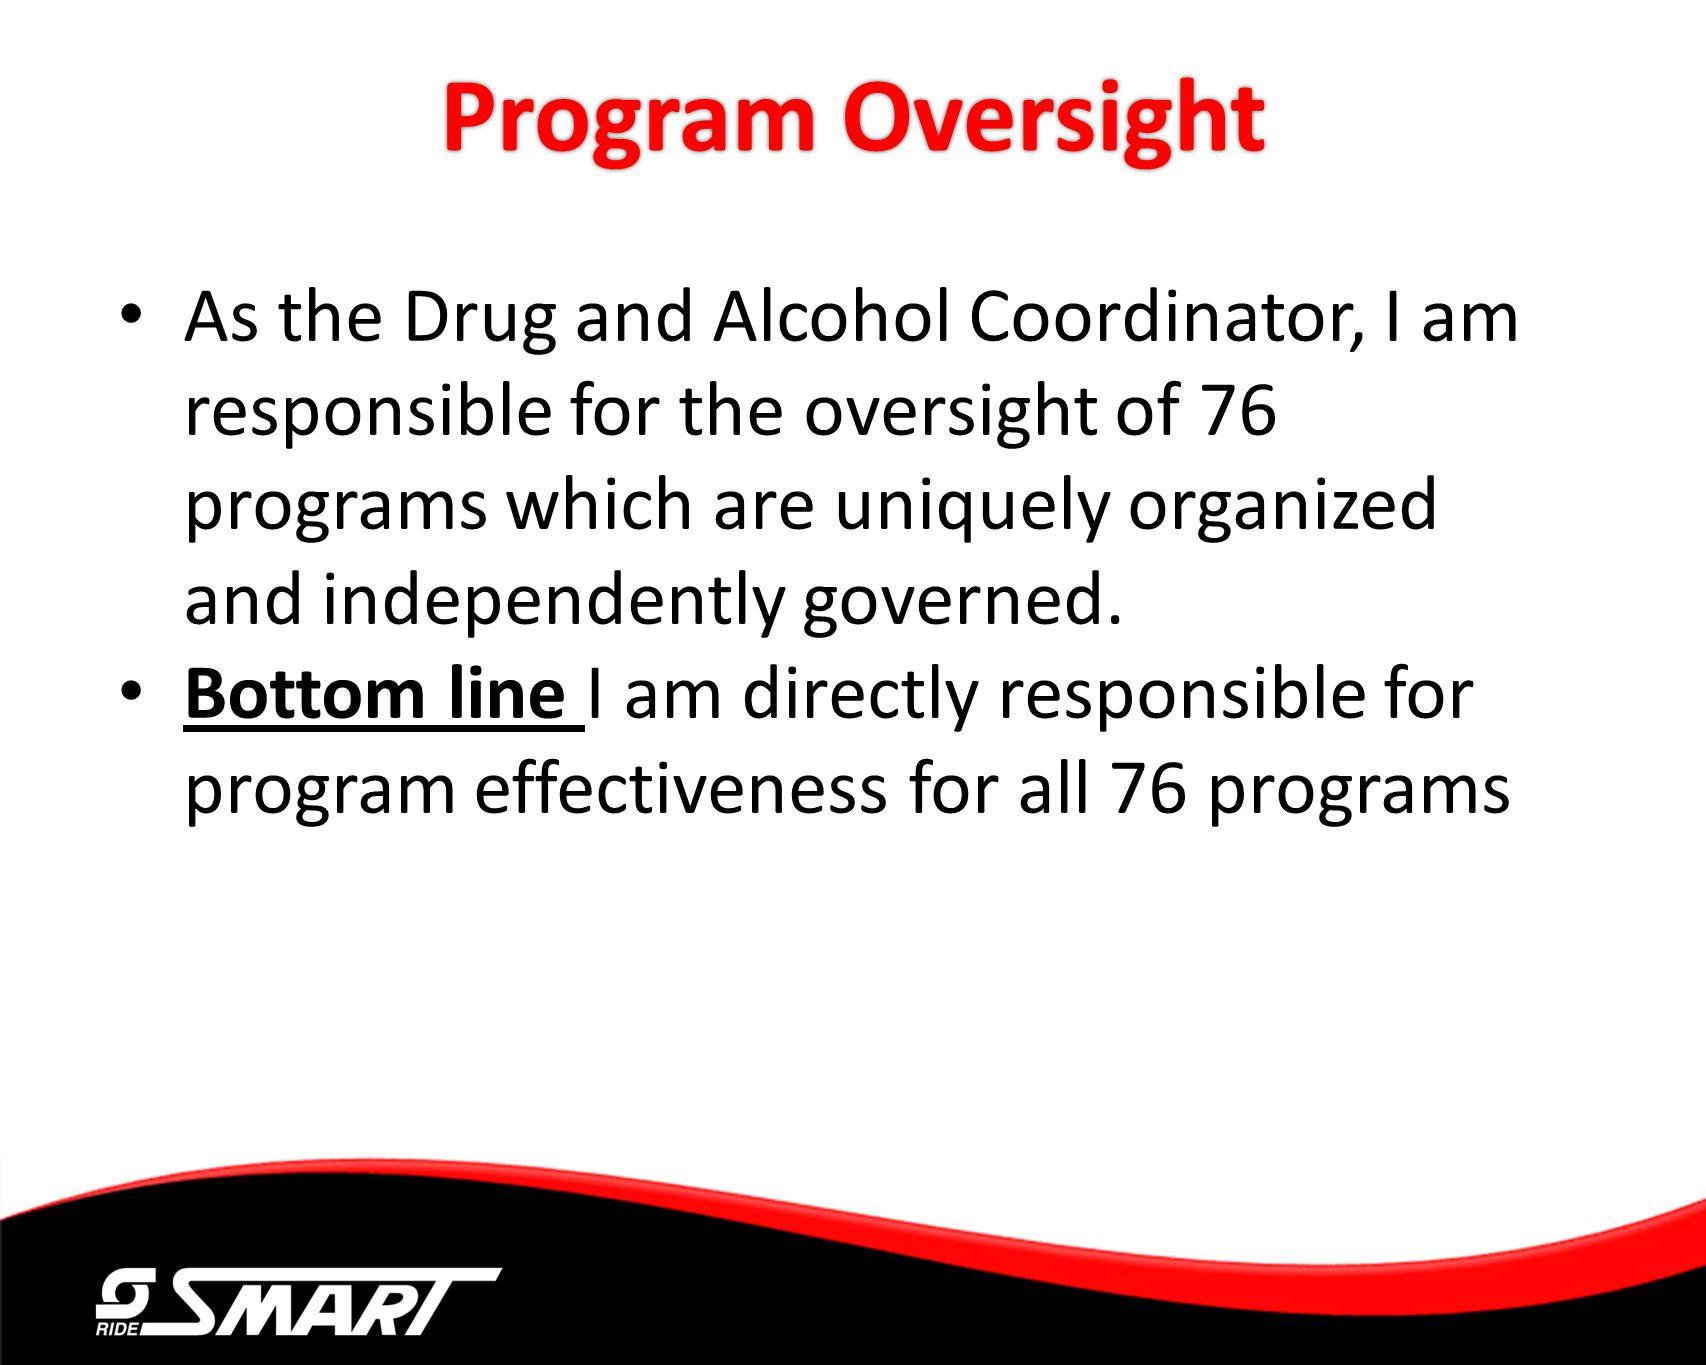 Program Oversight